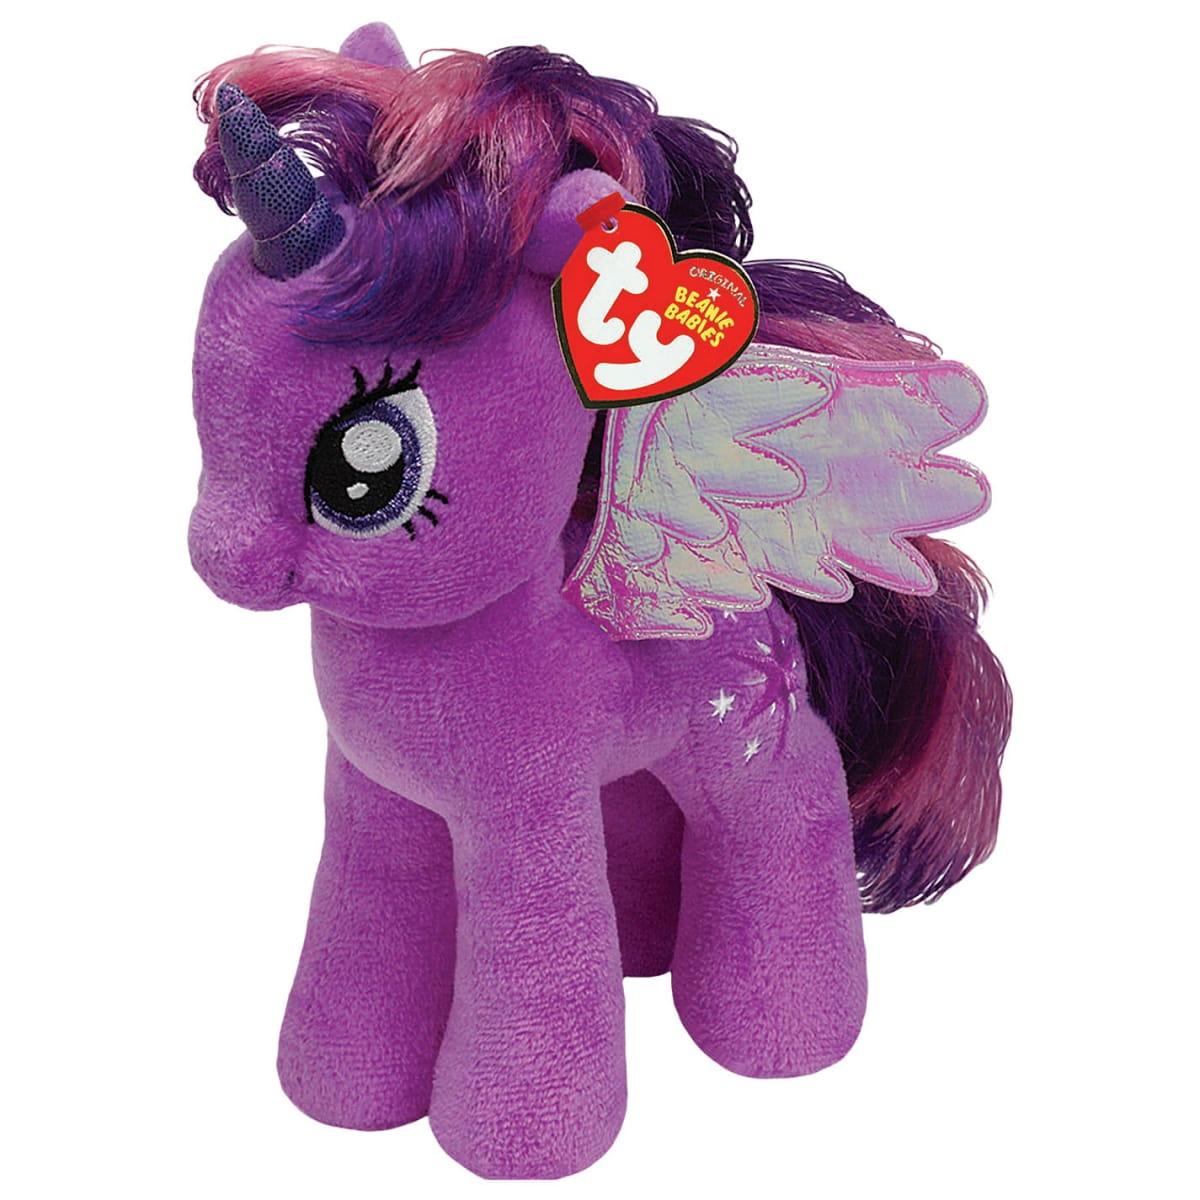 Игровой набор My Little Pony Twilight Sparkle Твайлайт Спаркл - 20 см (TY)